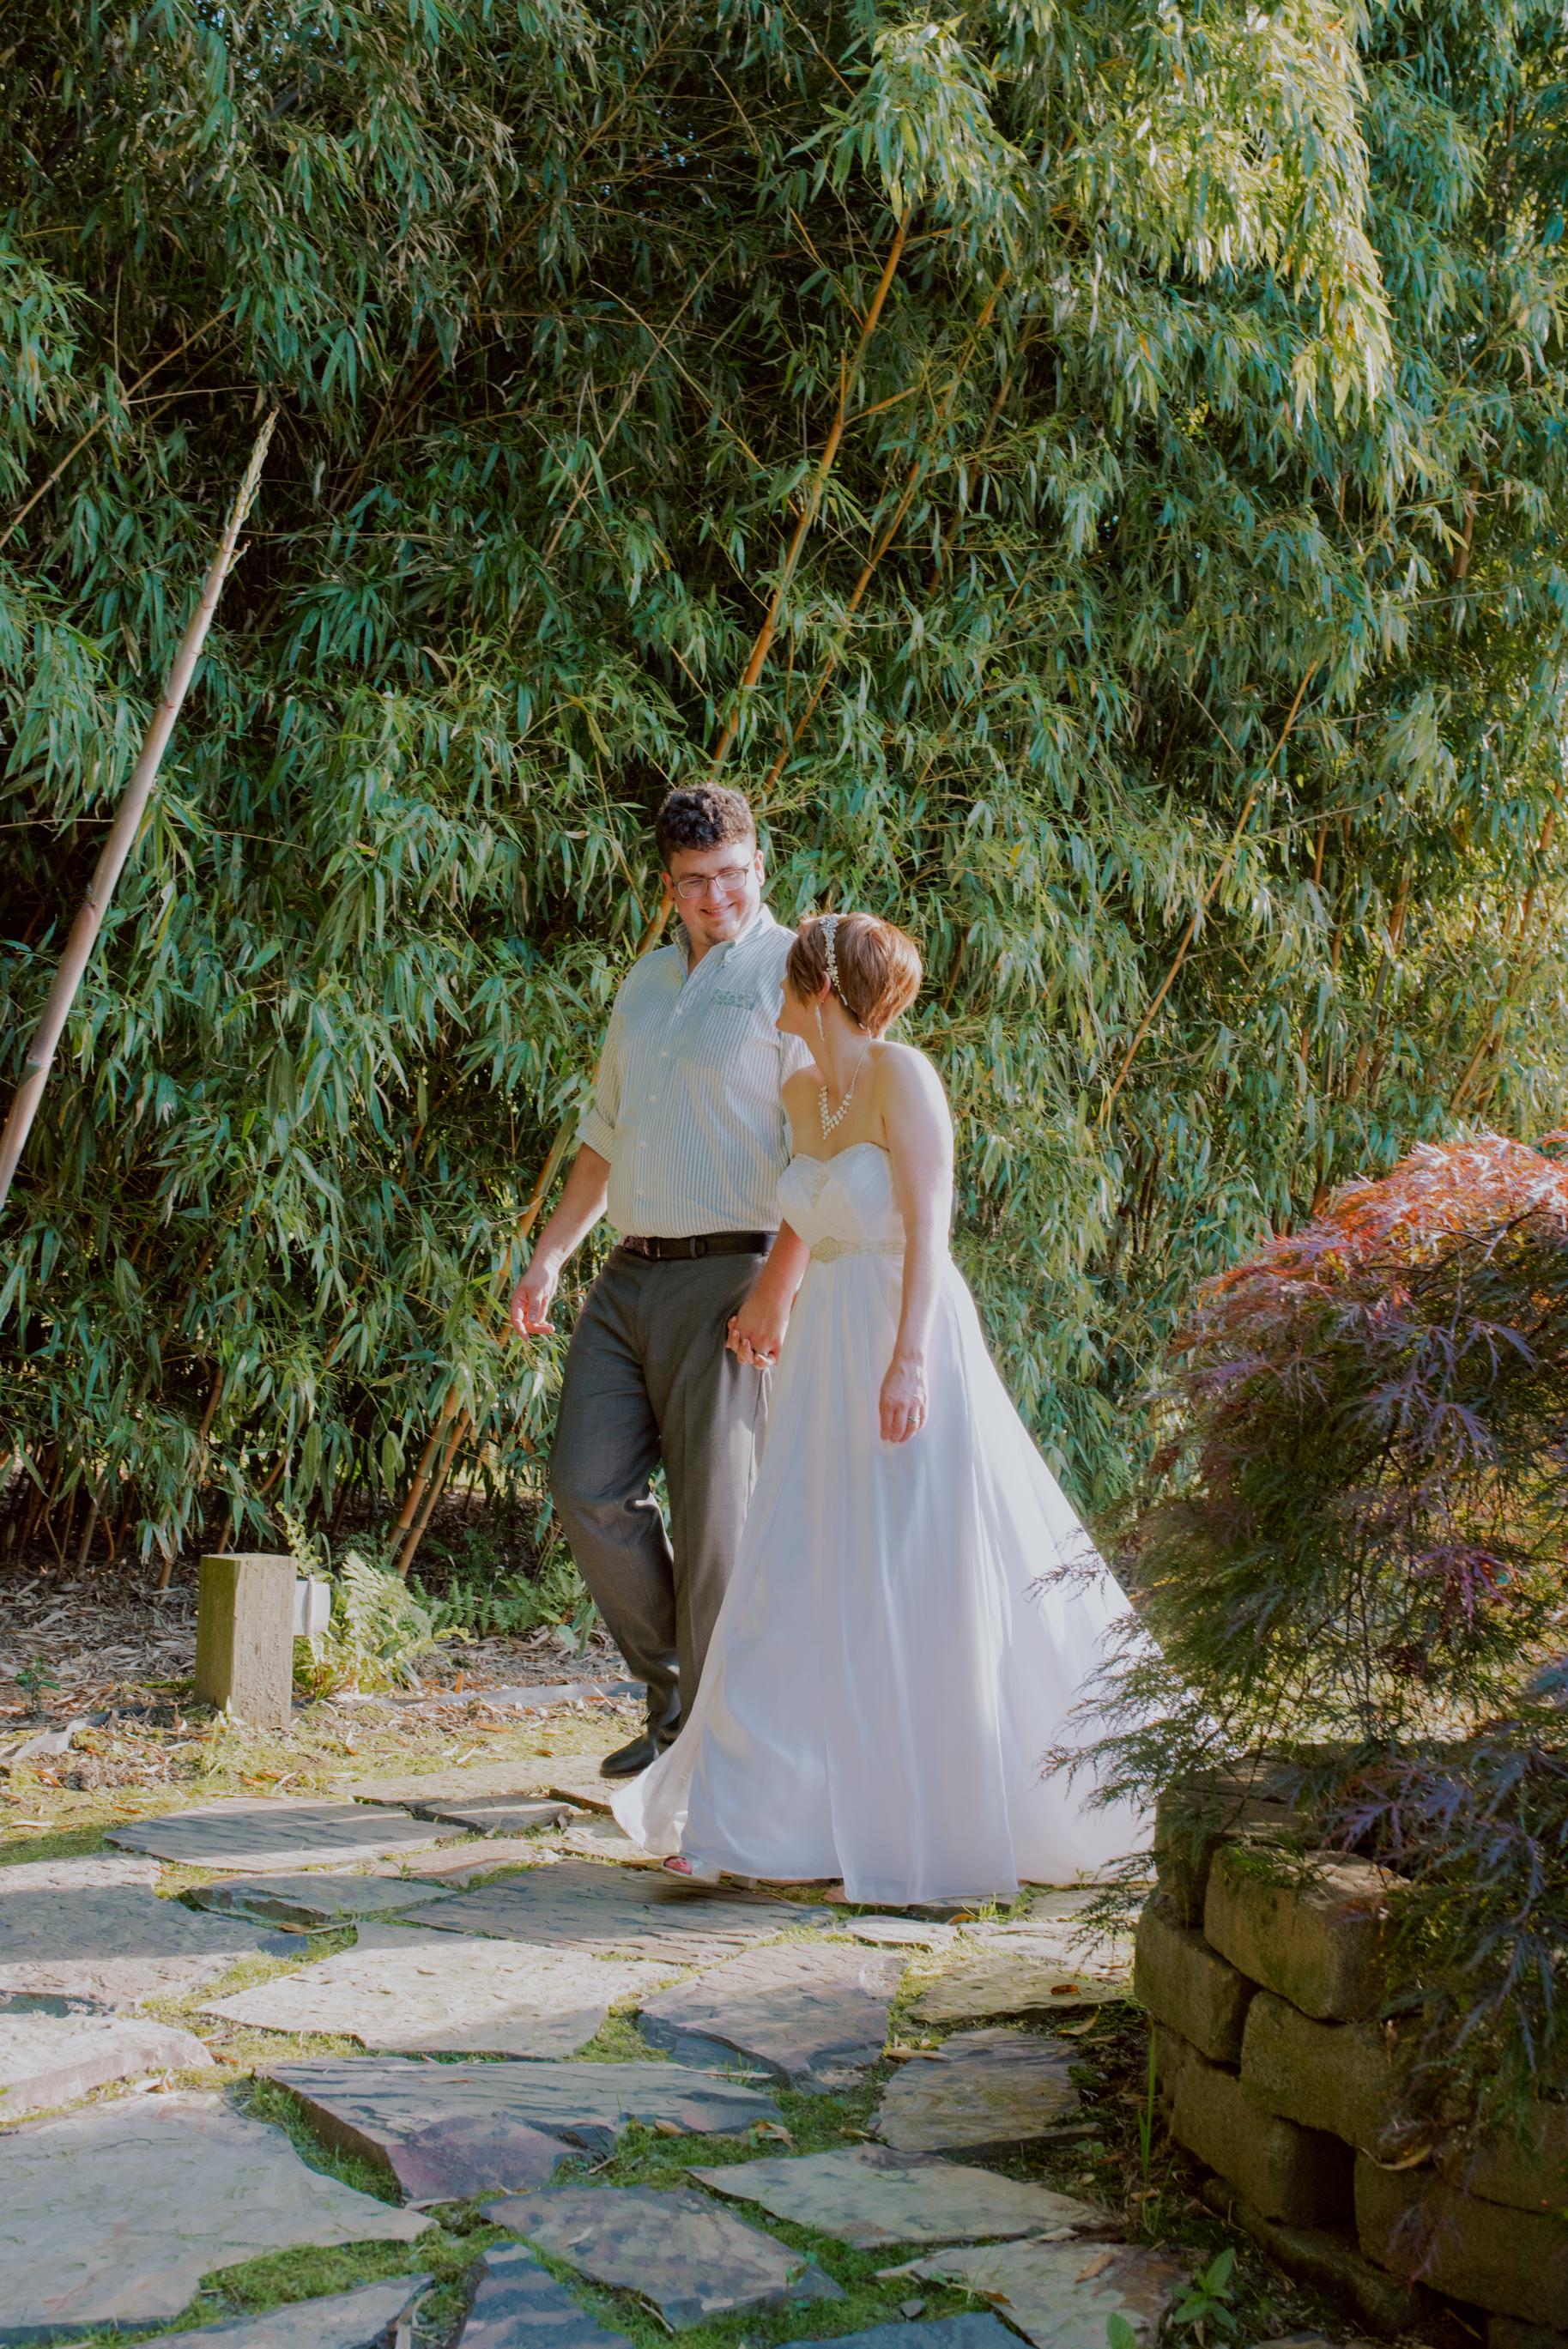 Sarah and Evan - PNW Wedding - Washington Elopement - I Do - Itzel Luccas Photography - Small File -385.JPG